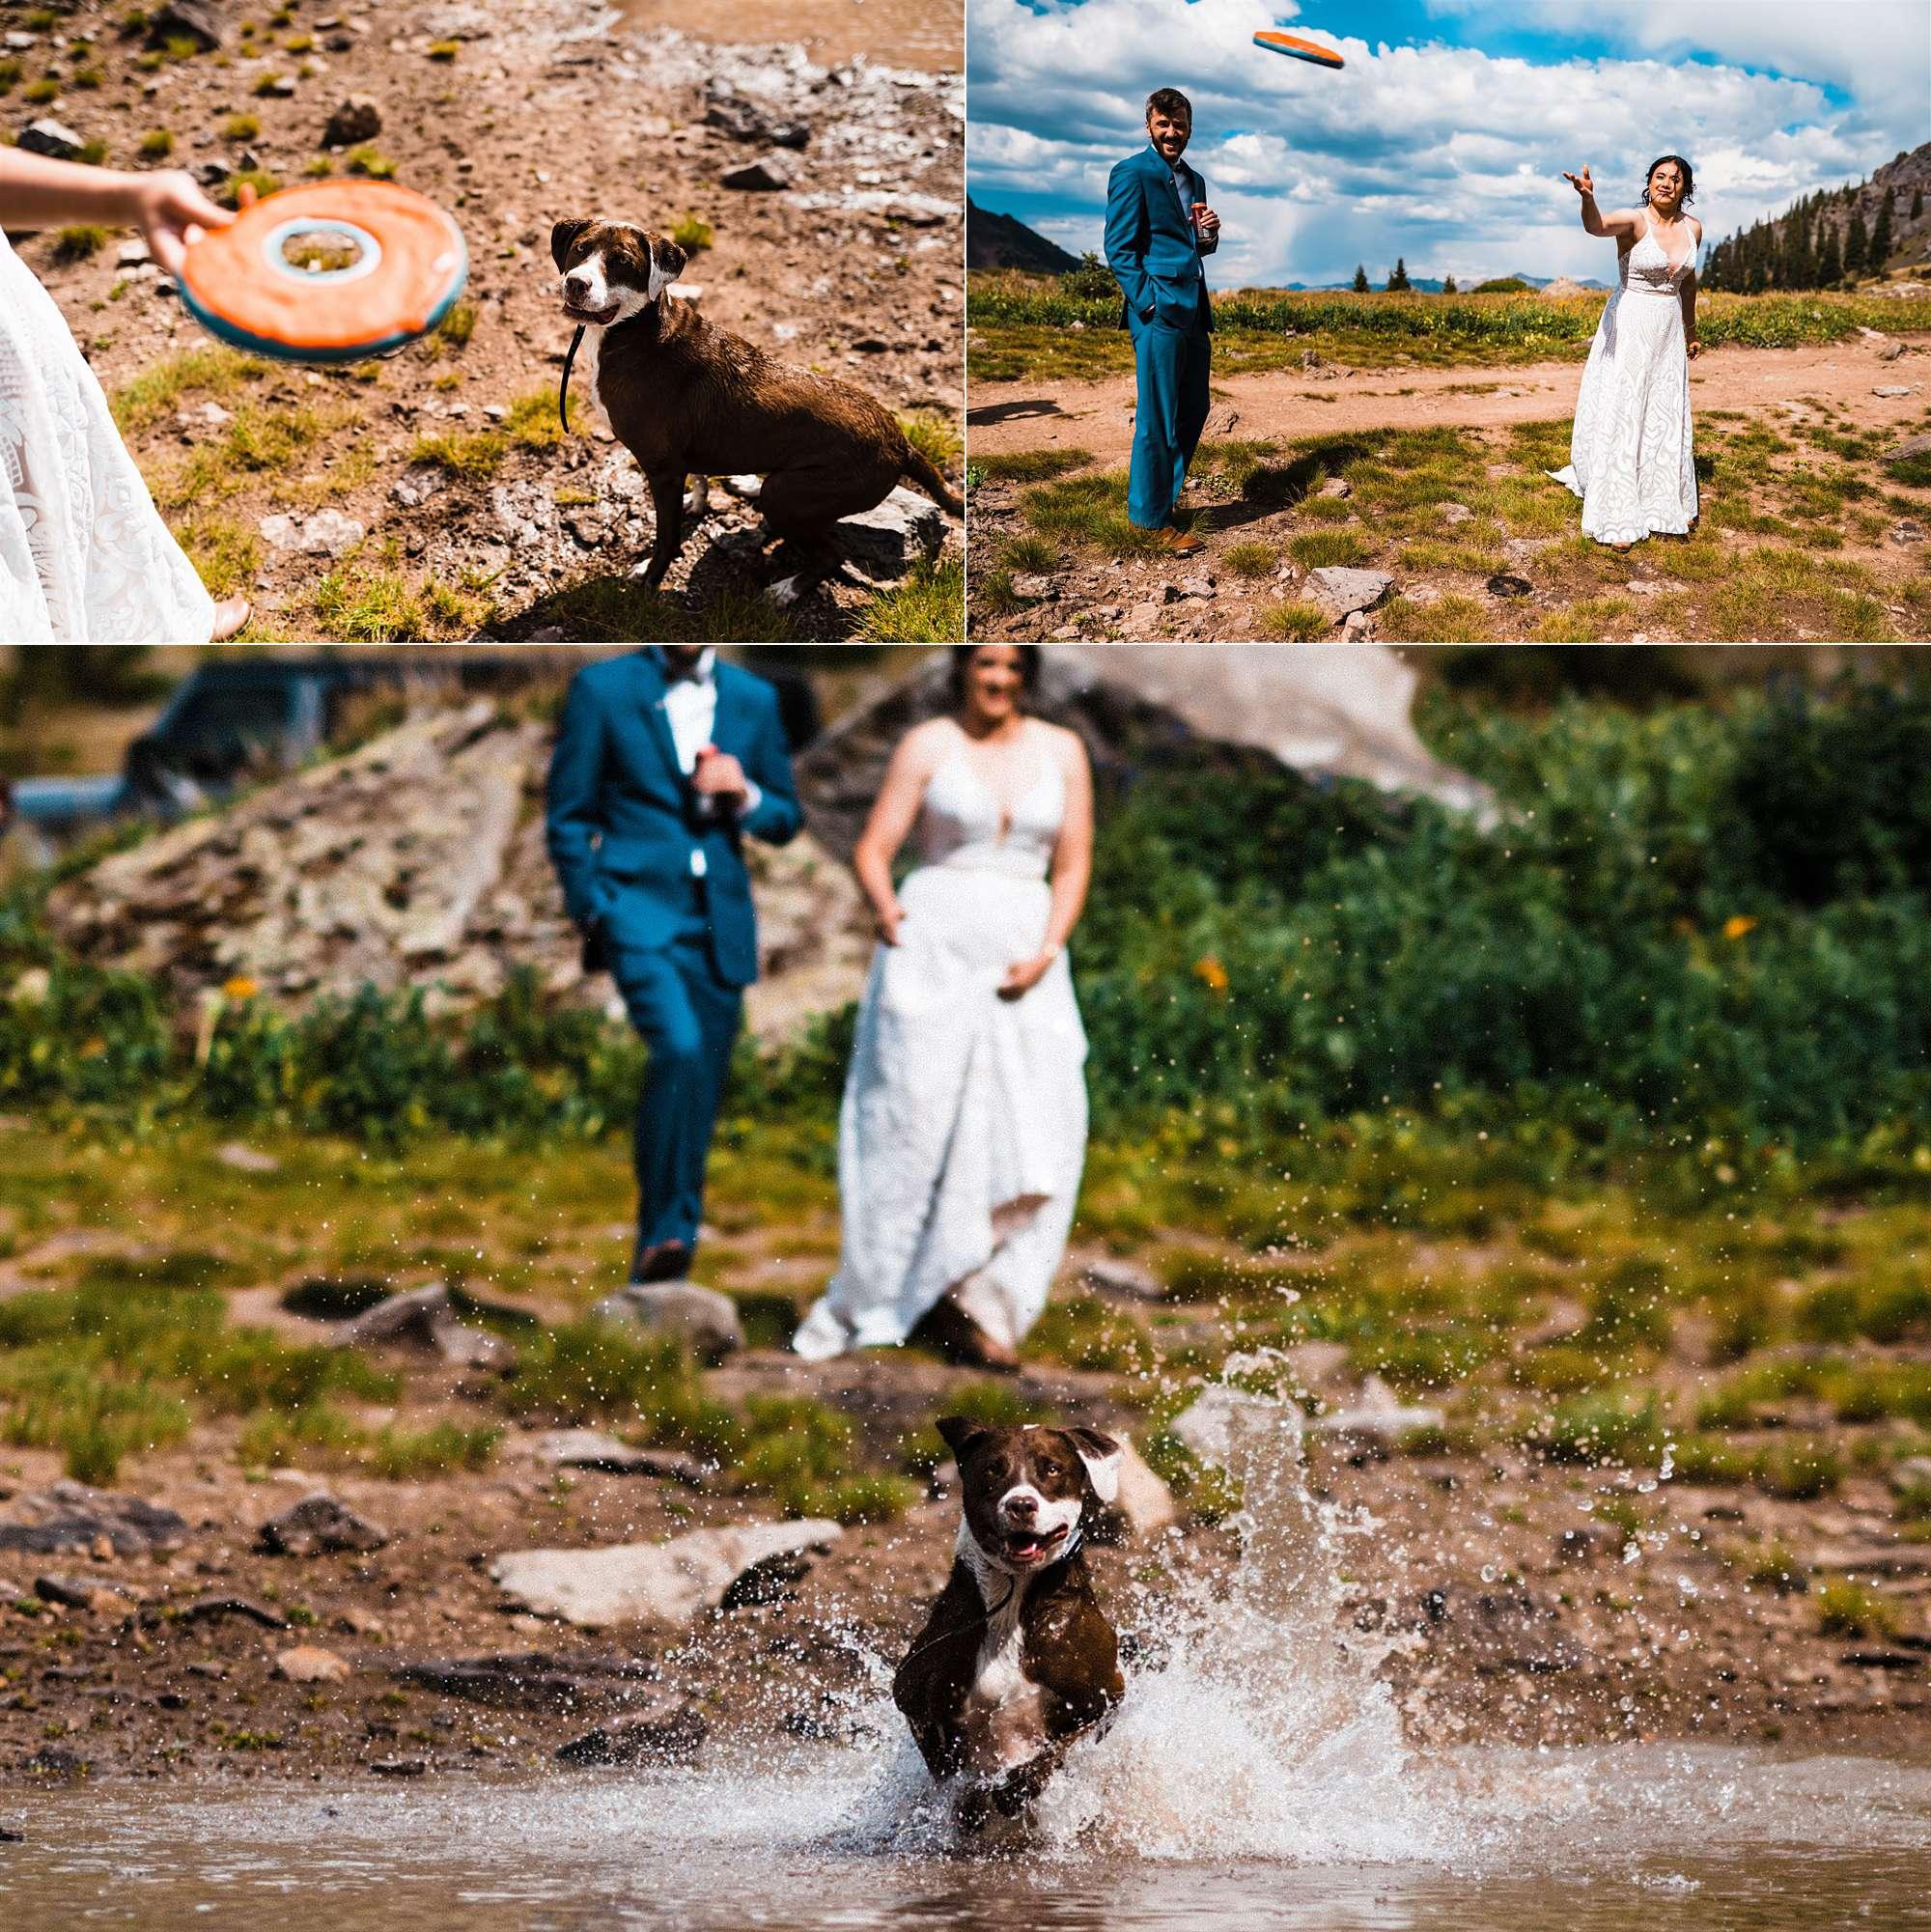 Colorado_Jeeping_Elopement_Emily_Matt_The_Foxes_Photography_0022.jpg